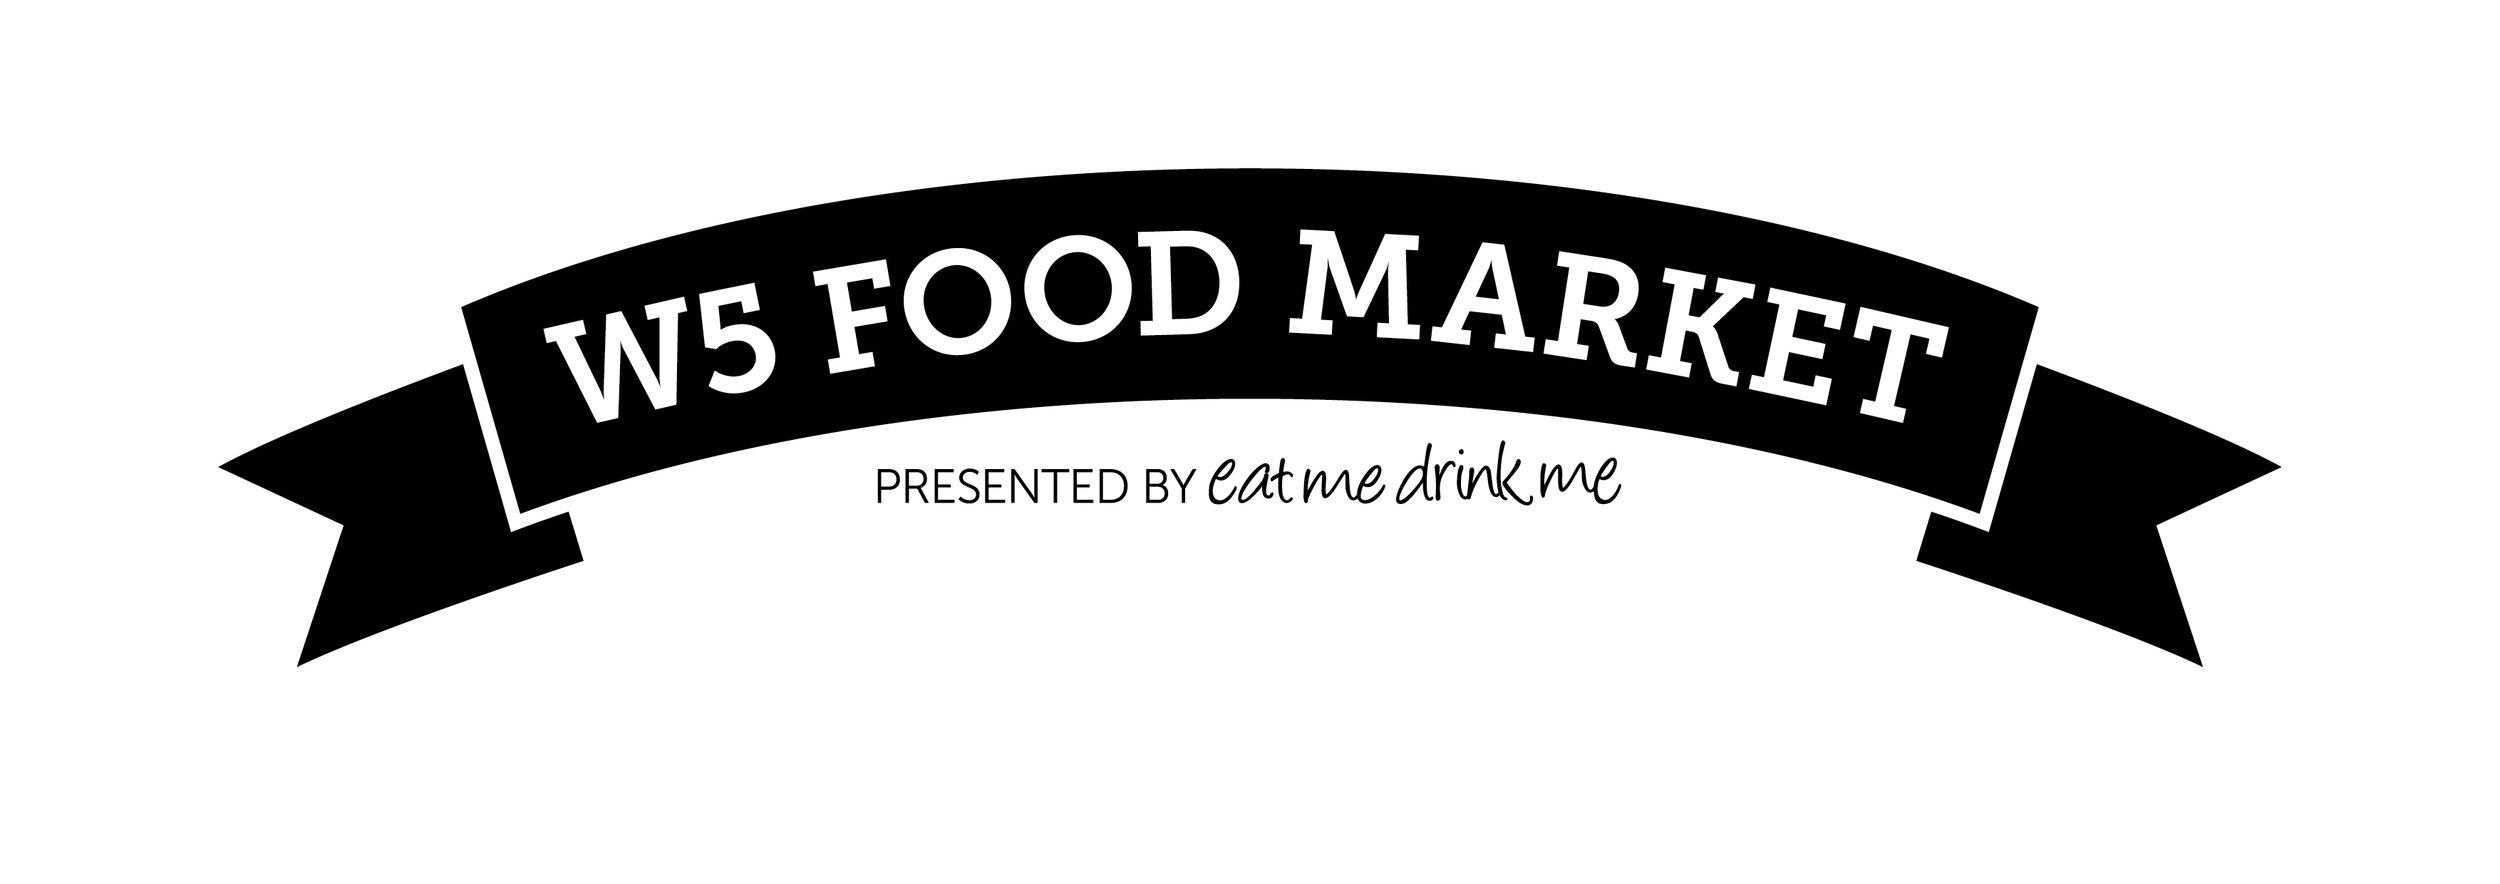 W5 Food Market, presented by eat me drink me